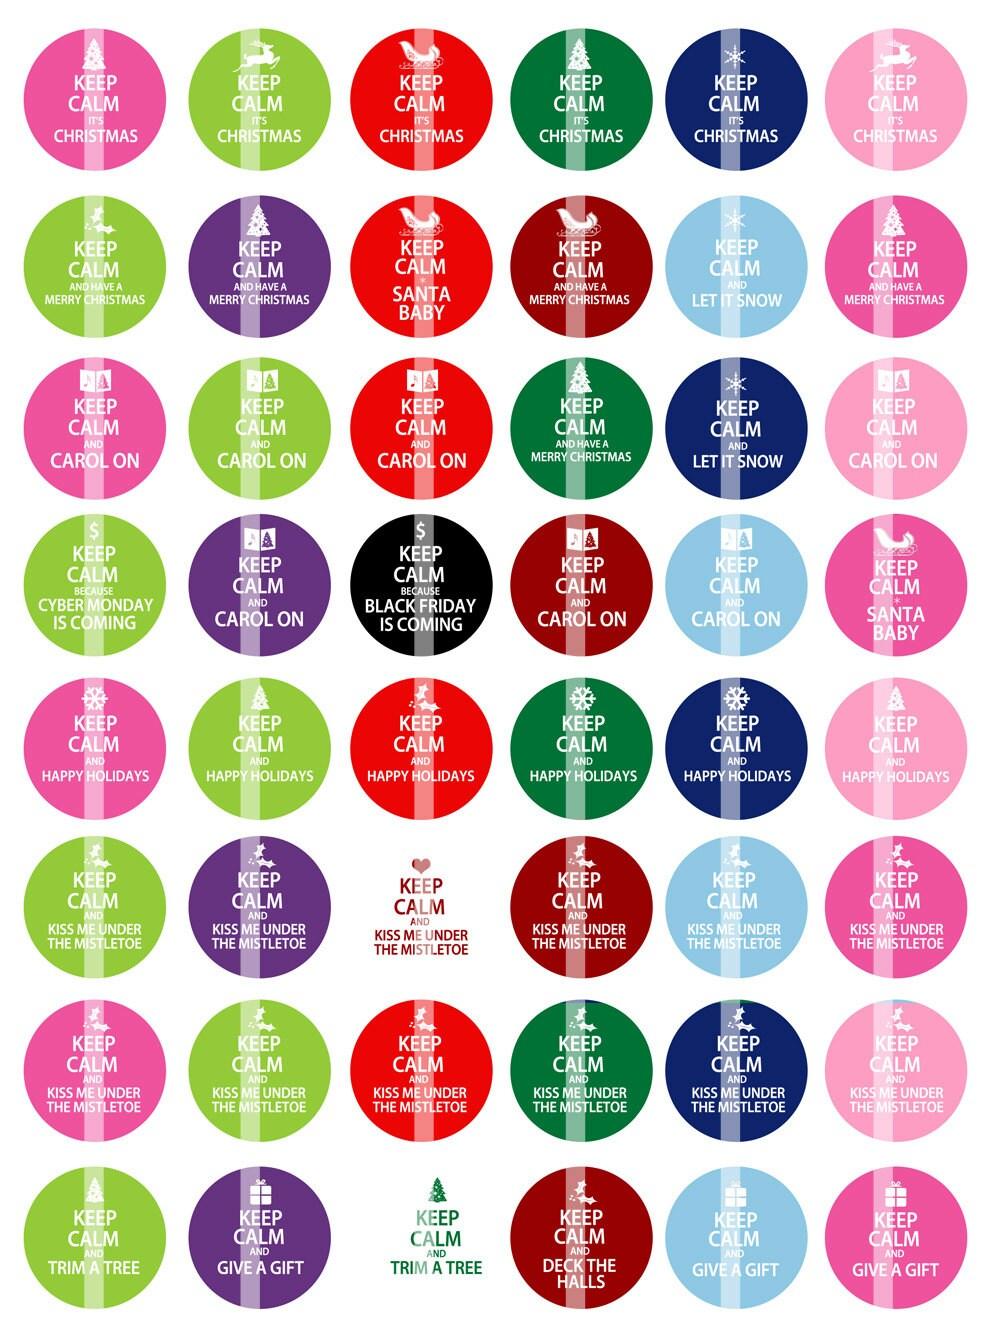 NEW Keep Calm Christmas Sayings 1 inch Round Digital | Etsy